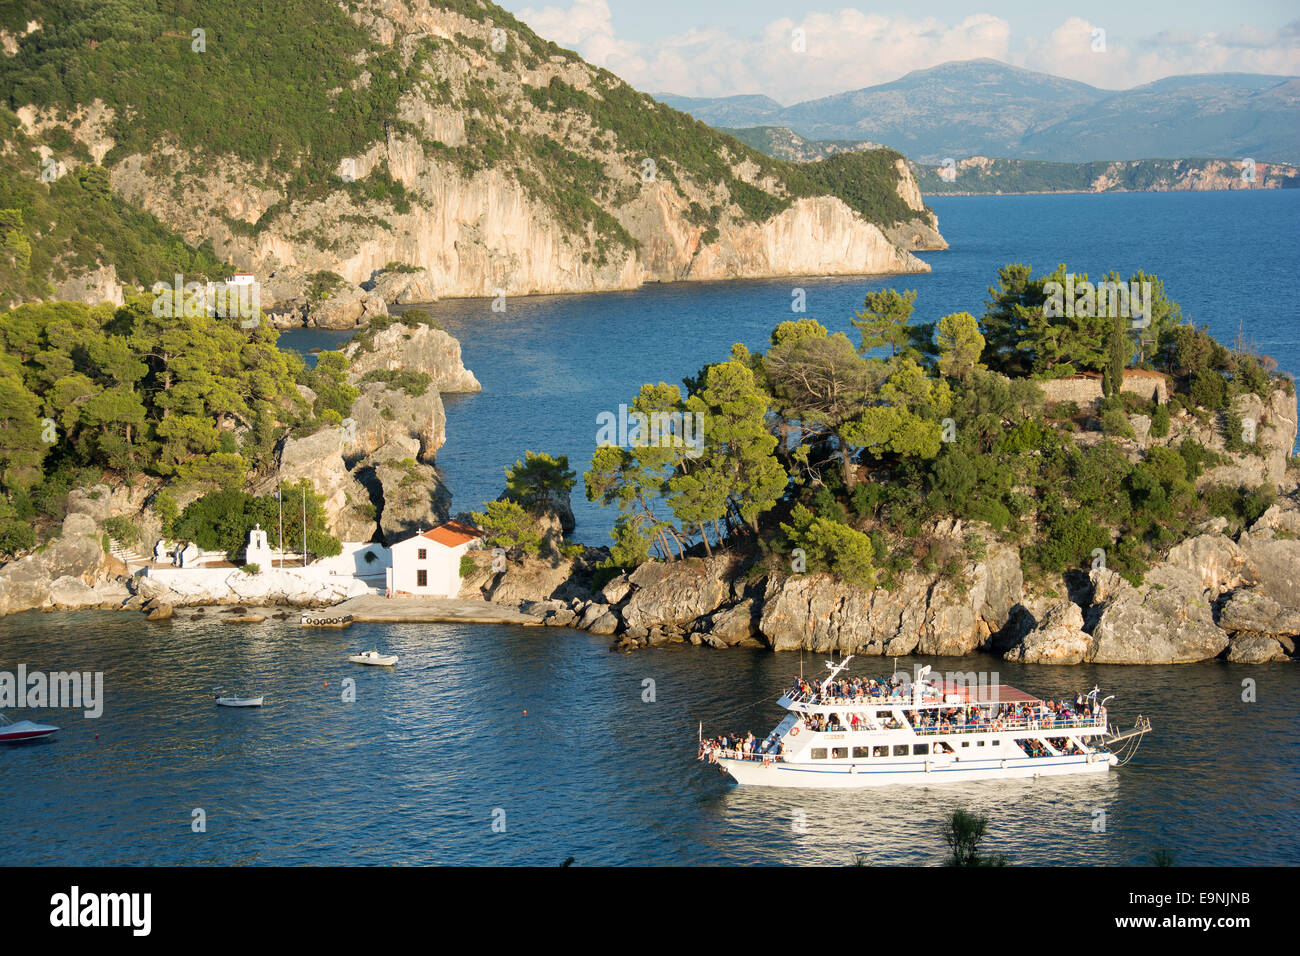 EPIRUS, GREECE. A tour boat passing Panagias Island in the bay of Parga. 2014. - Stock Image